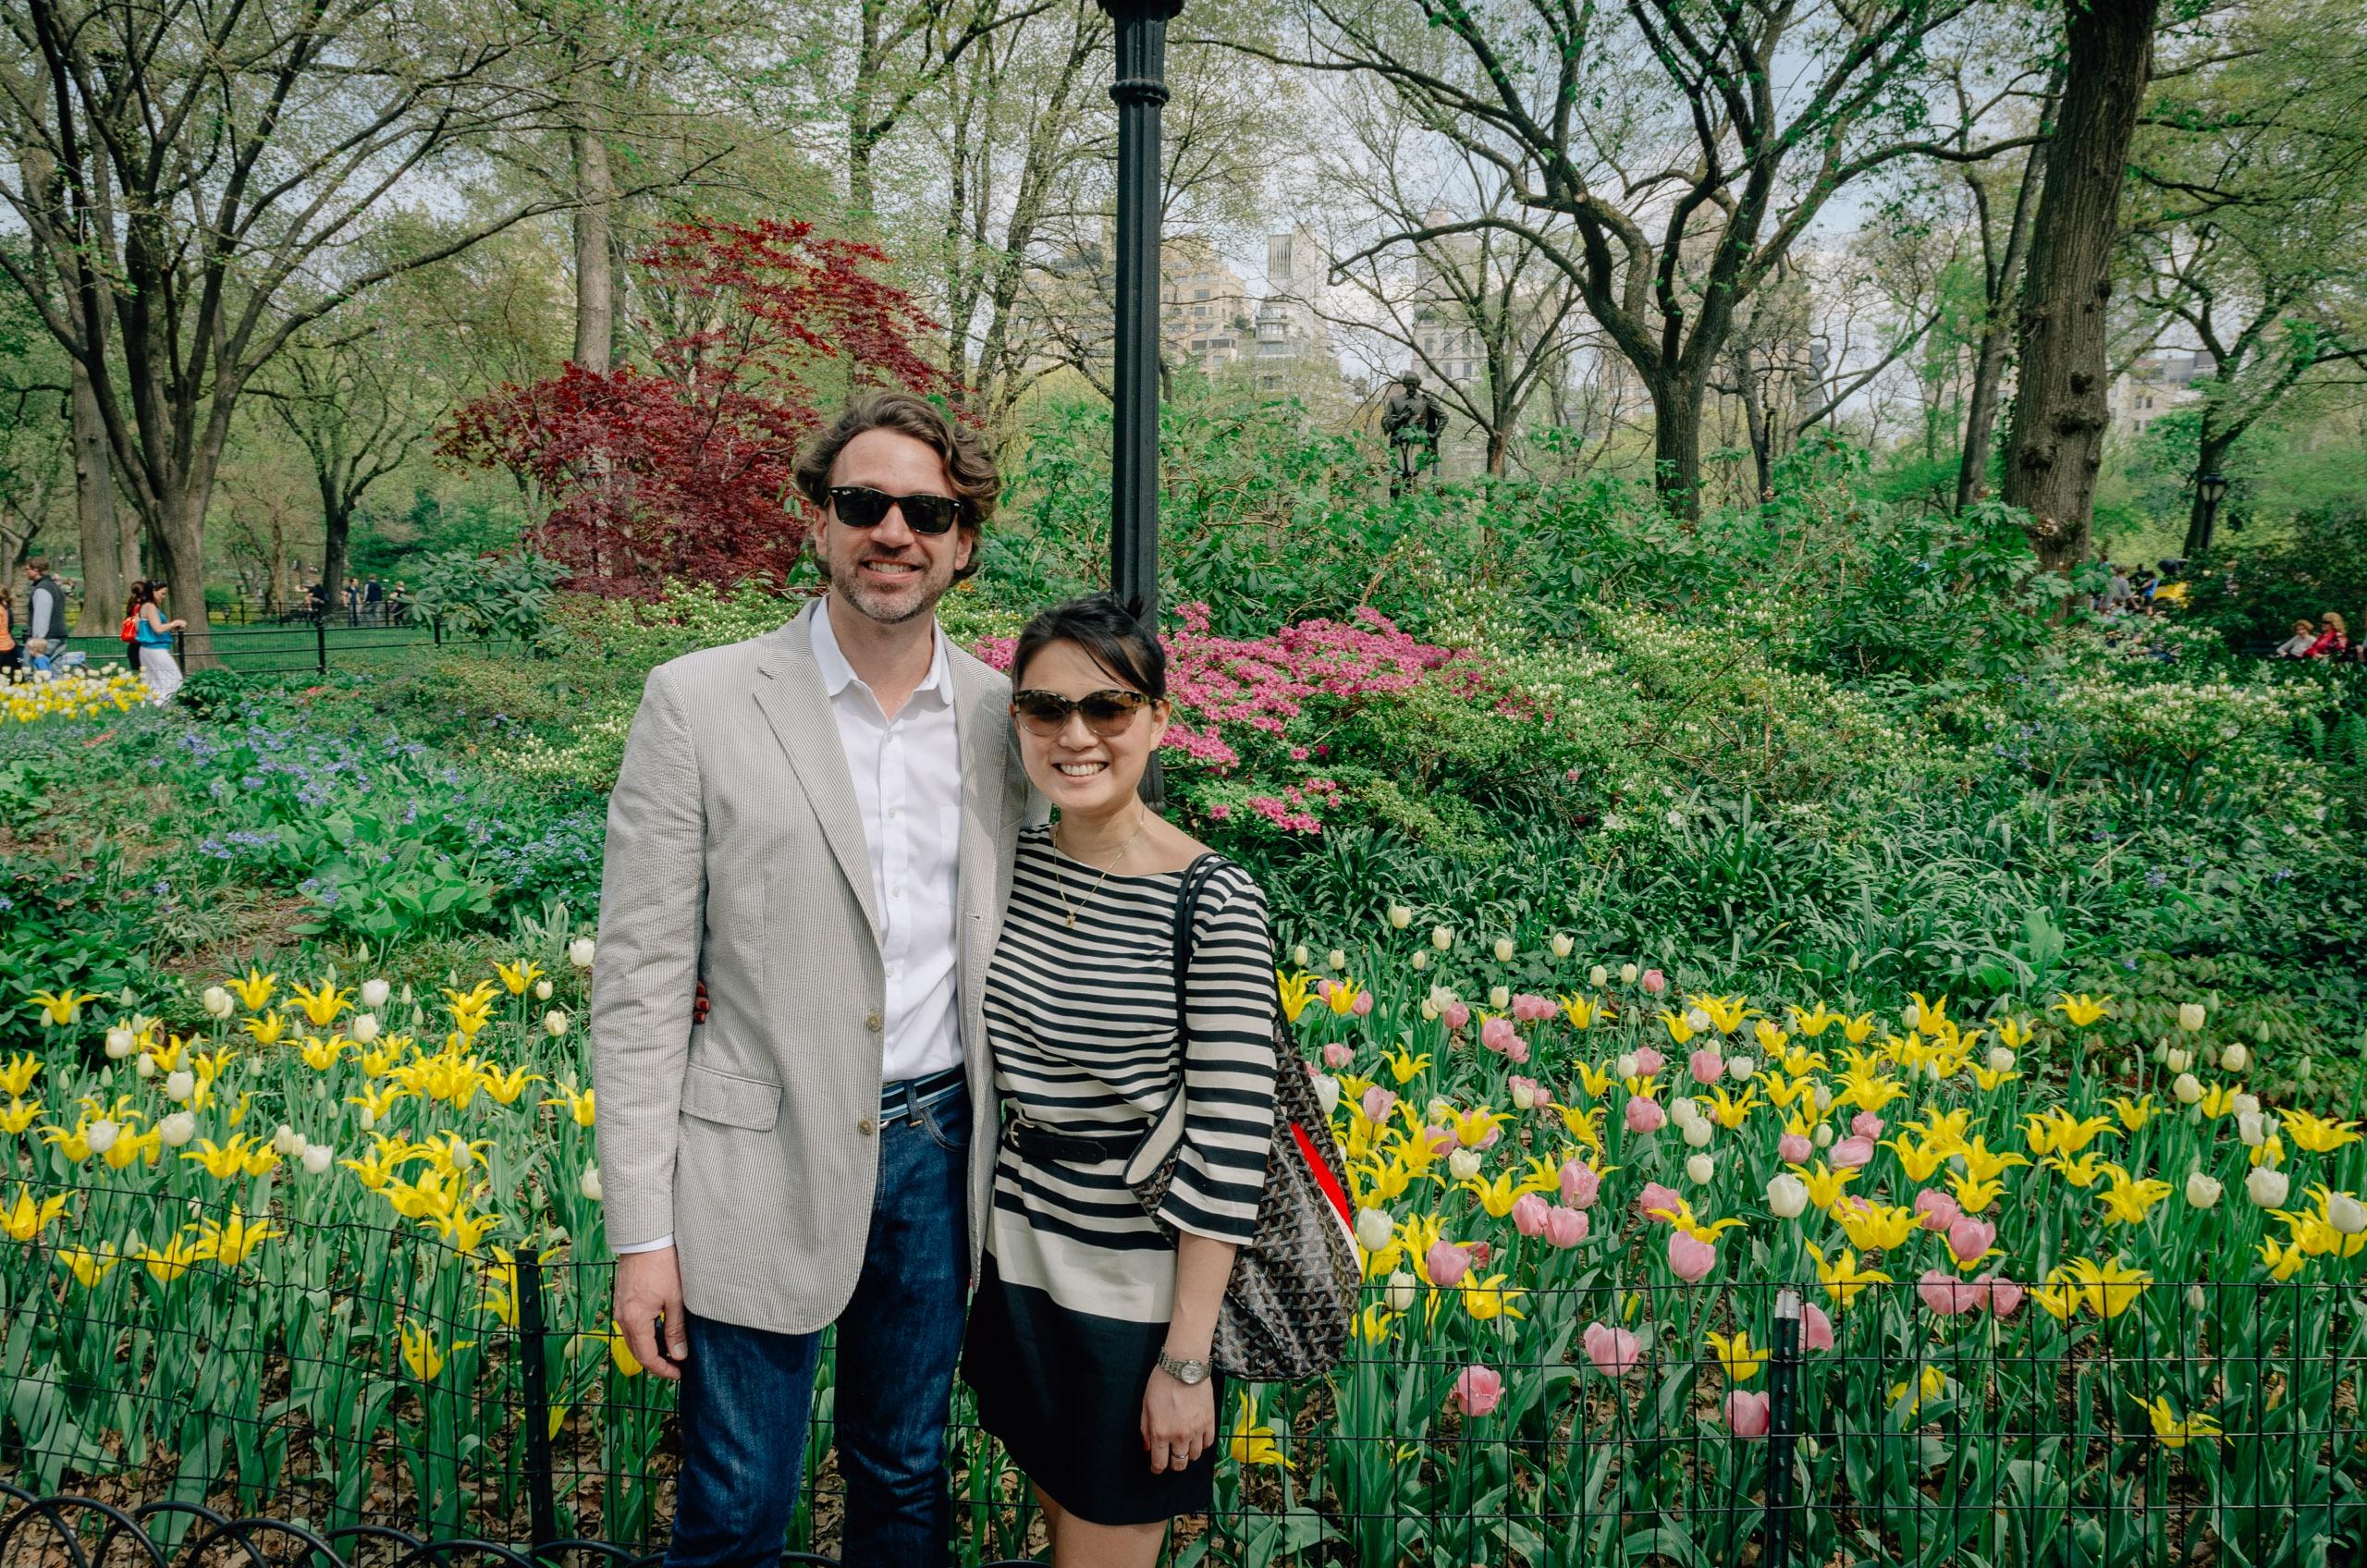 Birthday in Central Park - 2012-0415-DSC_2325